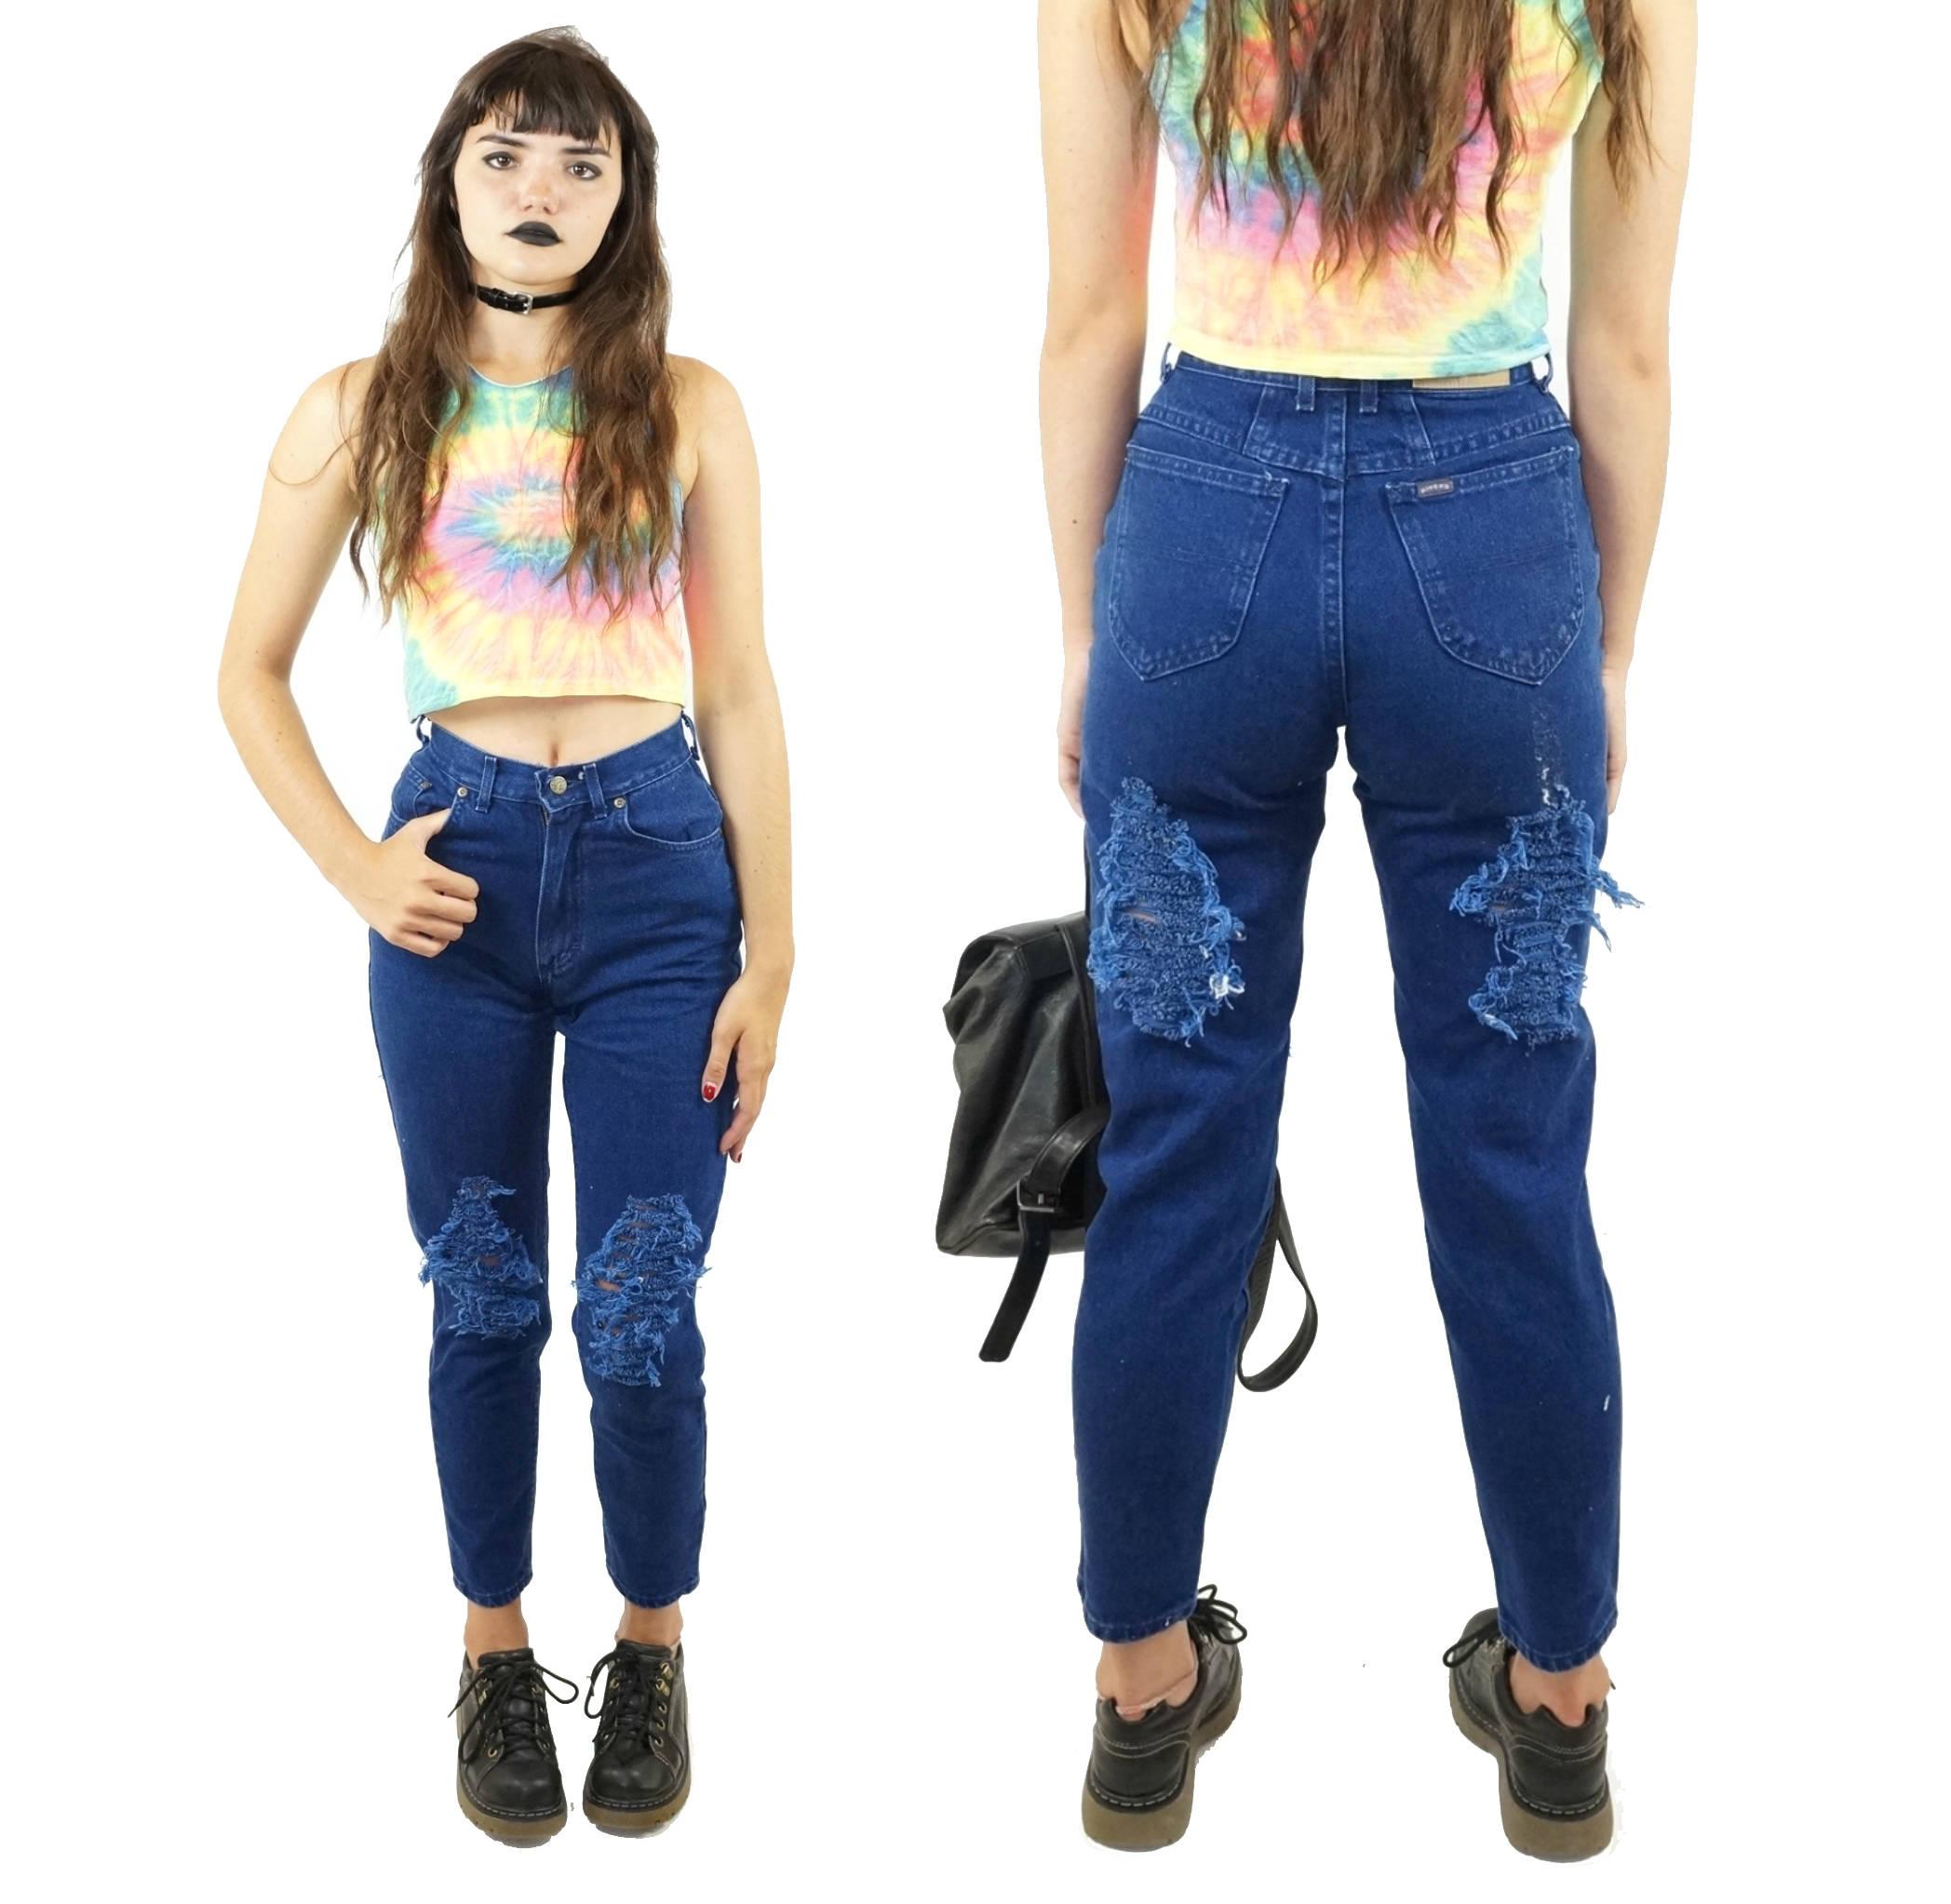 Dark Wash Riders 90s Mom Jeans Vintage Grunge Jeans